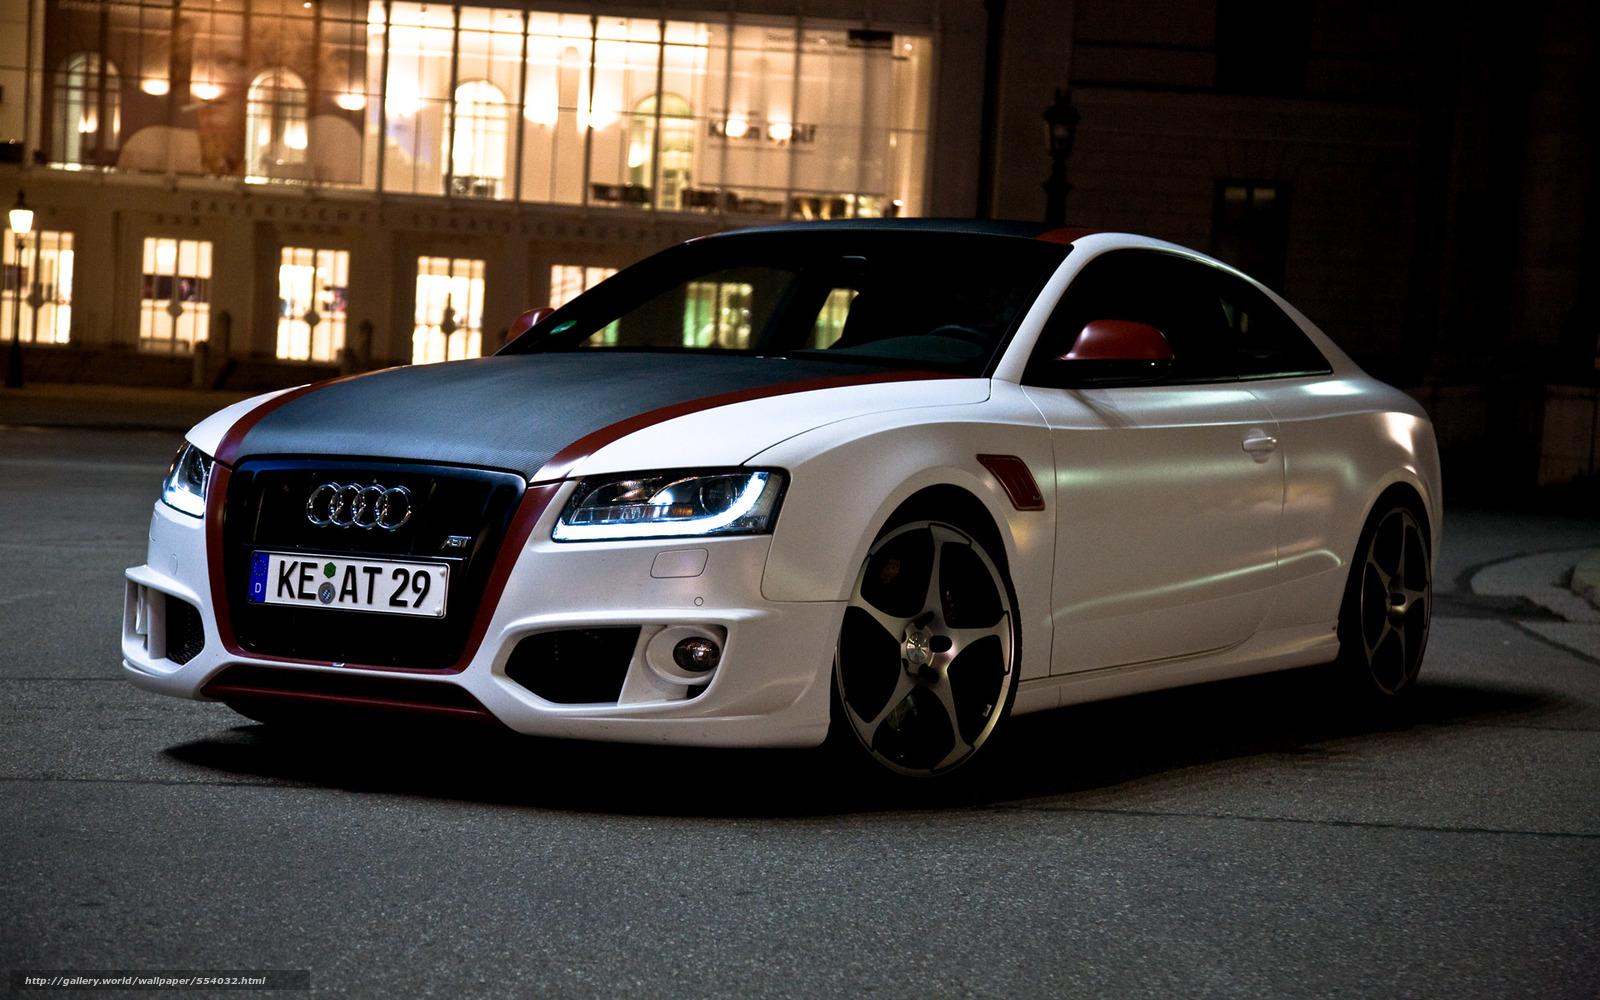 Download Wallpaper Audi A5 Abt Audi Tuning Free Desktop